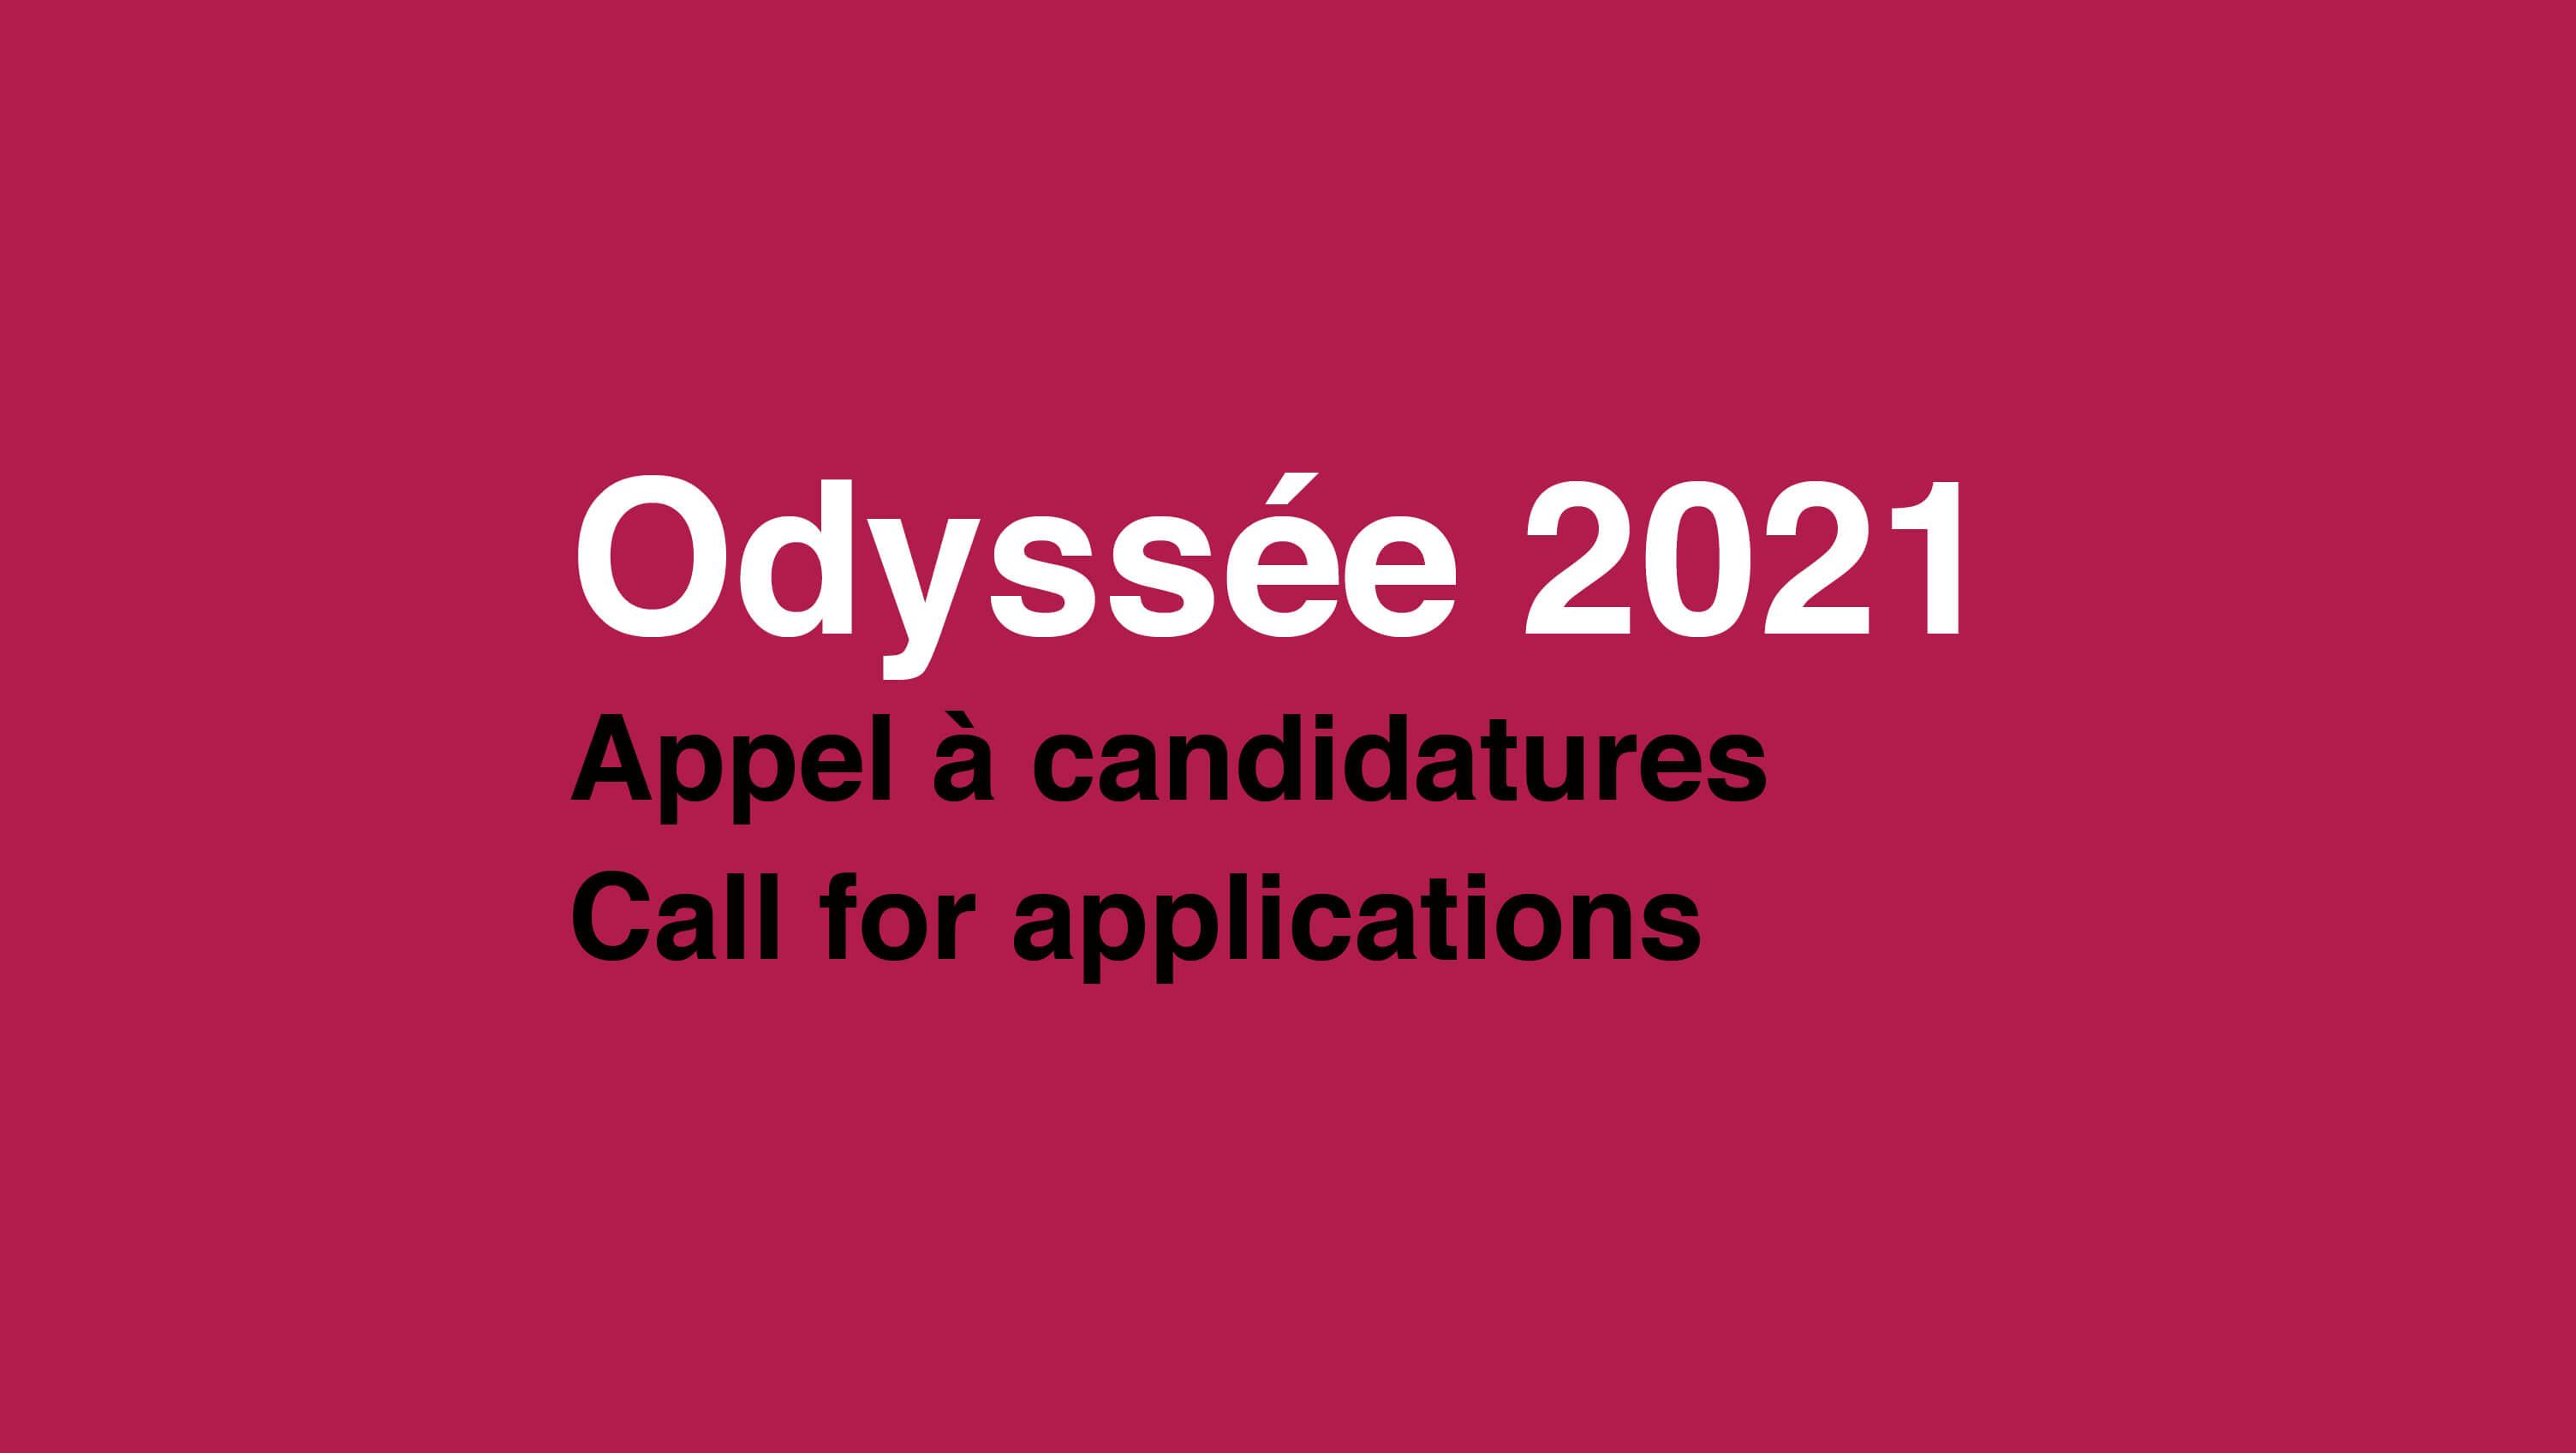 Call for applications: Odyssée 2021